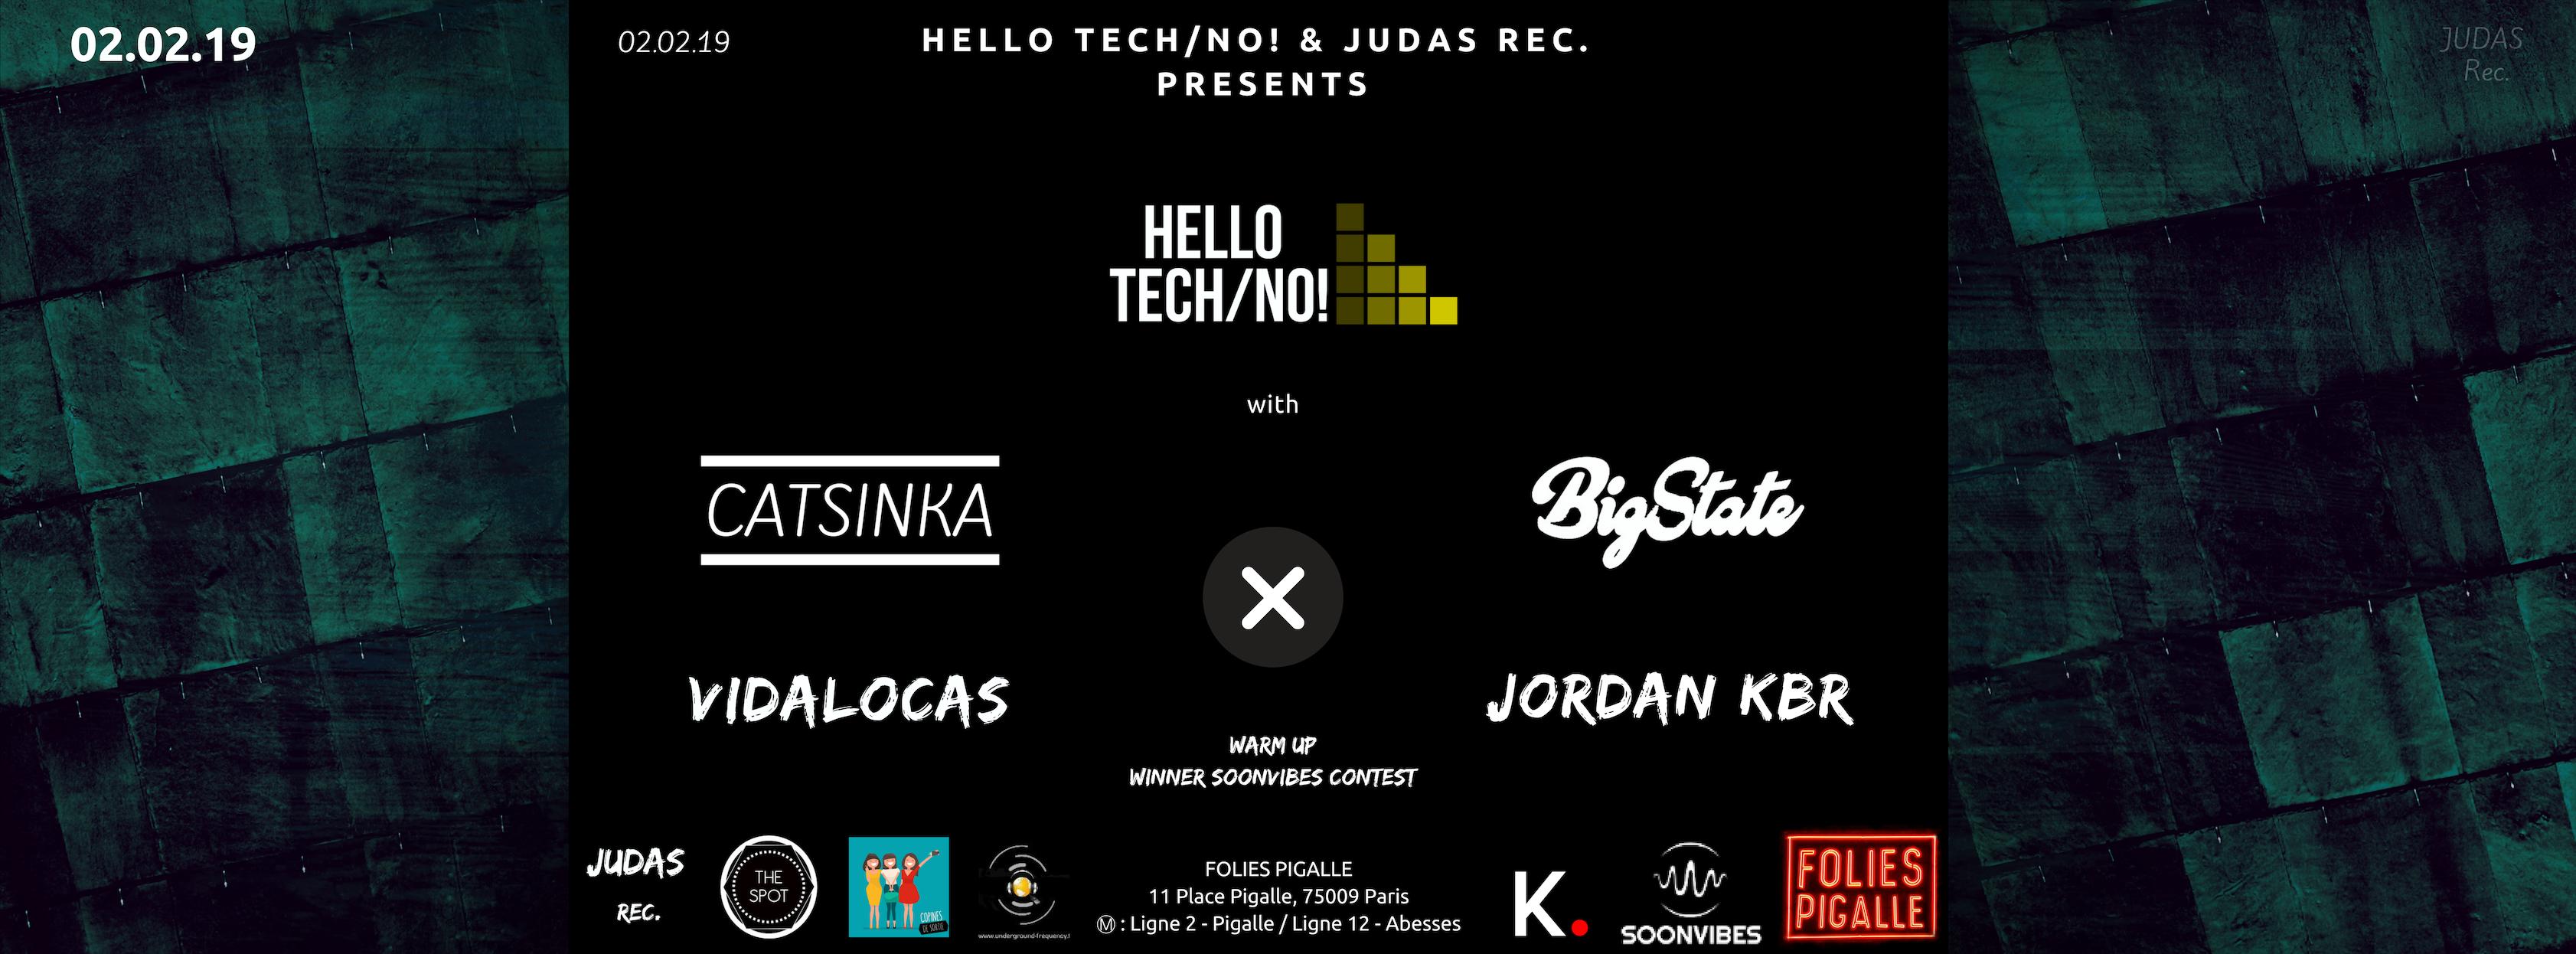 Hello Tech/No! - Catsinka x Bigstate x Vidalocas x Jordan Kbr